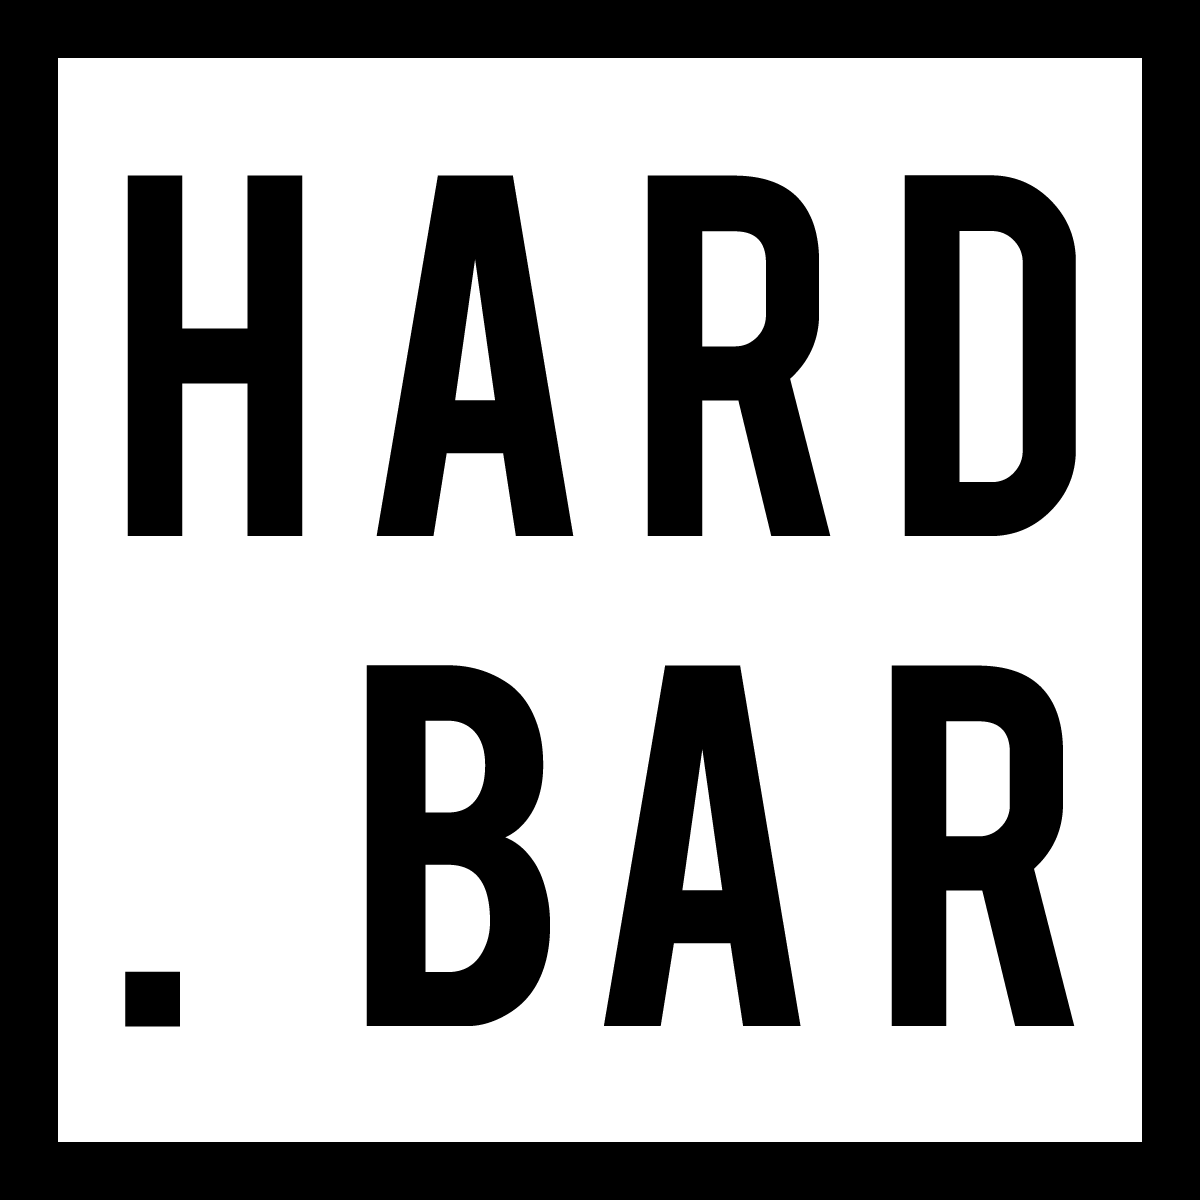 Hardbar Logo_Black.png